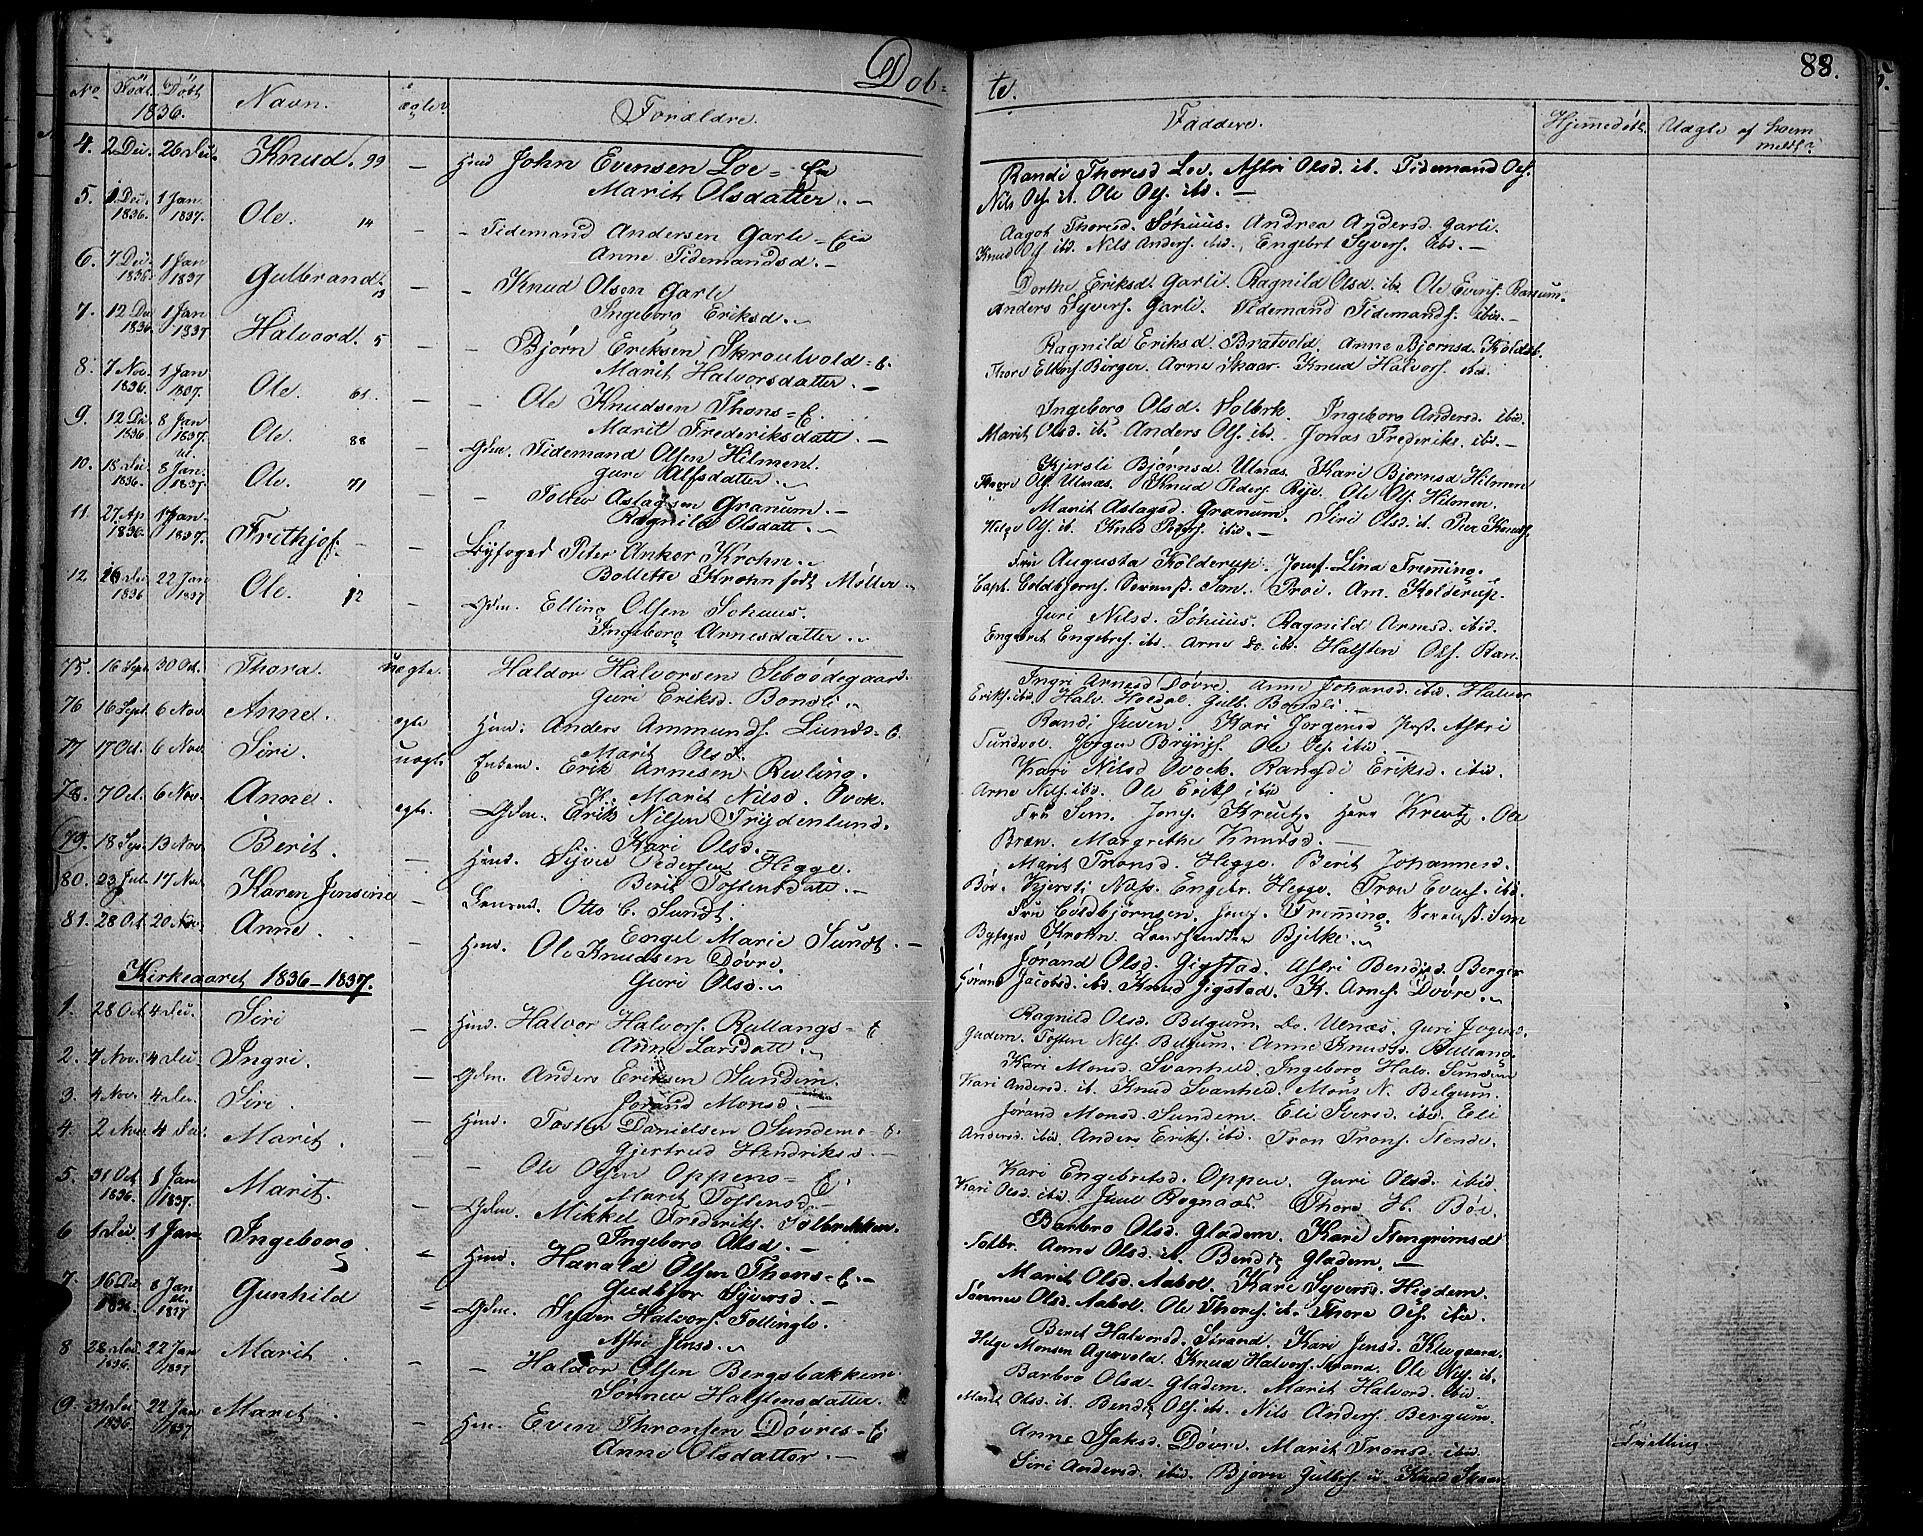 SAH, Nord-Aurdal prestekontor, Ministerialbok nr. 3, 1828-1841, s. 88